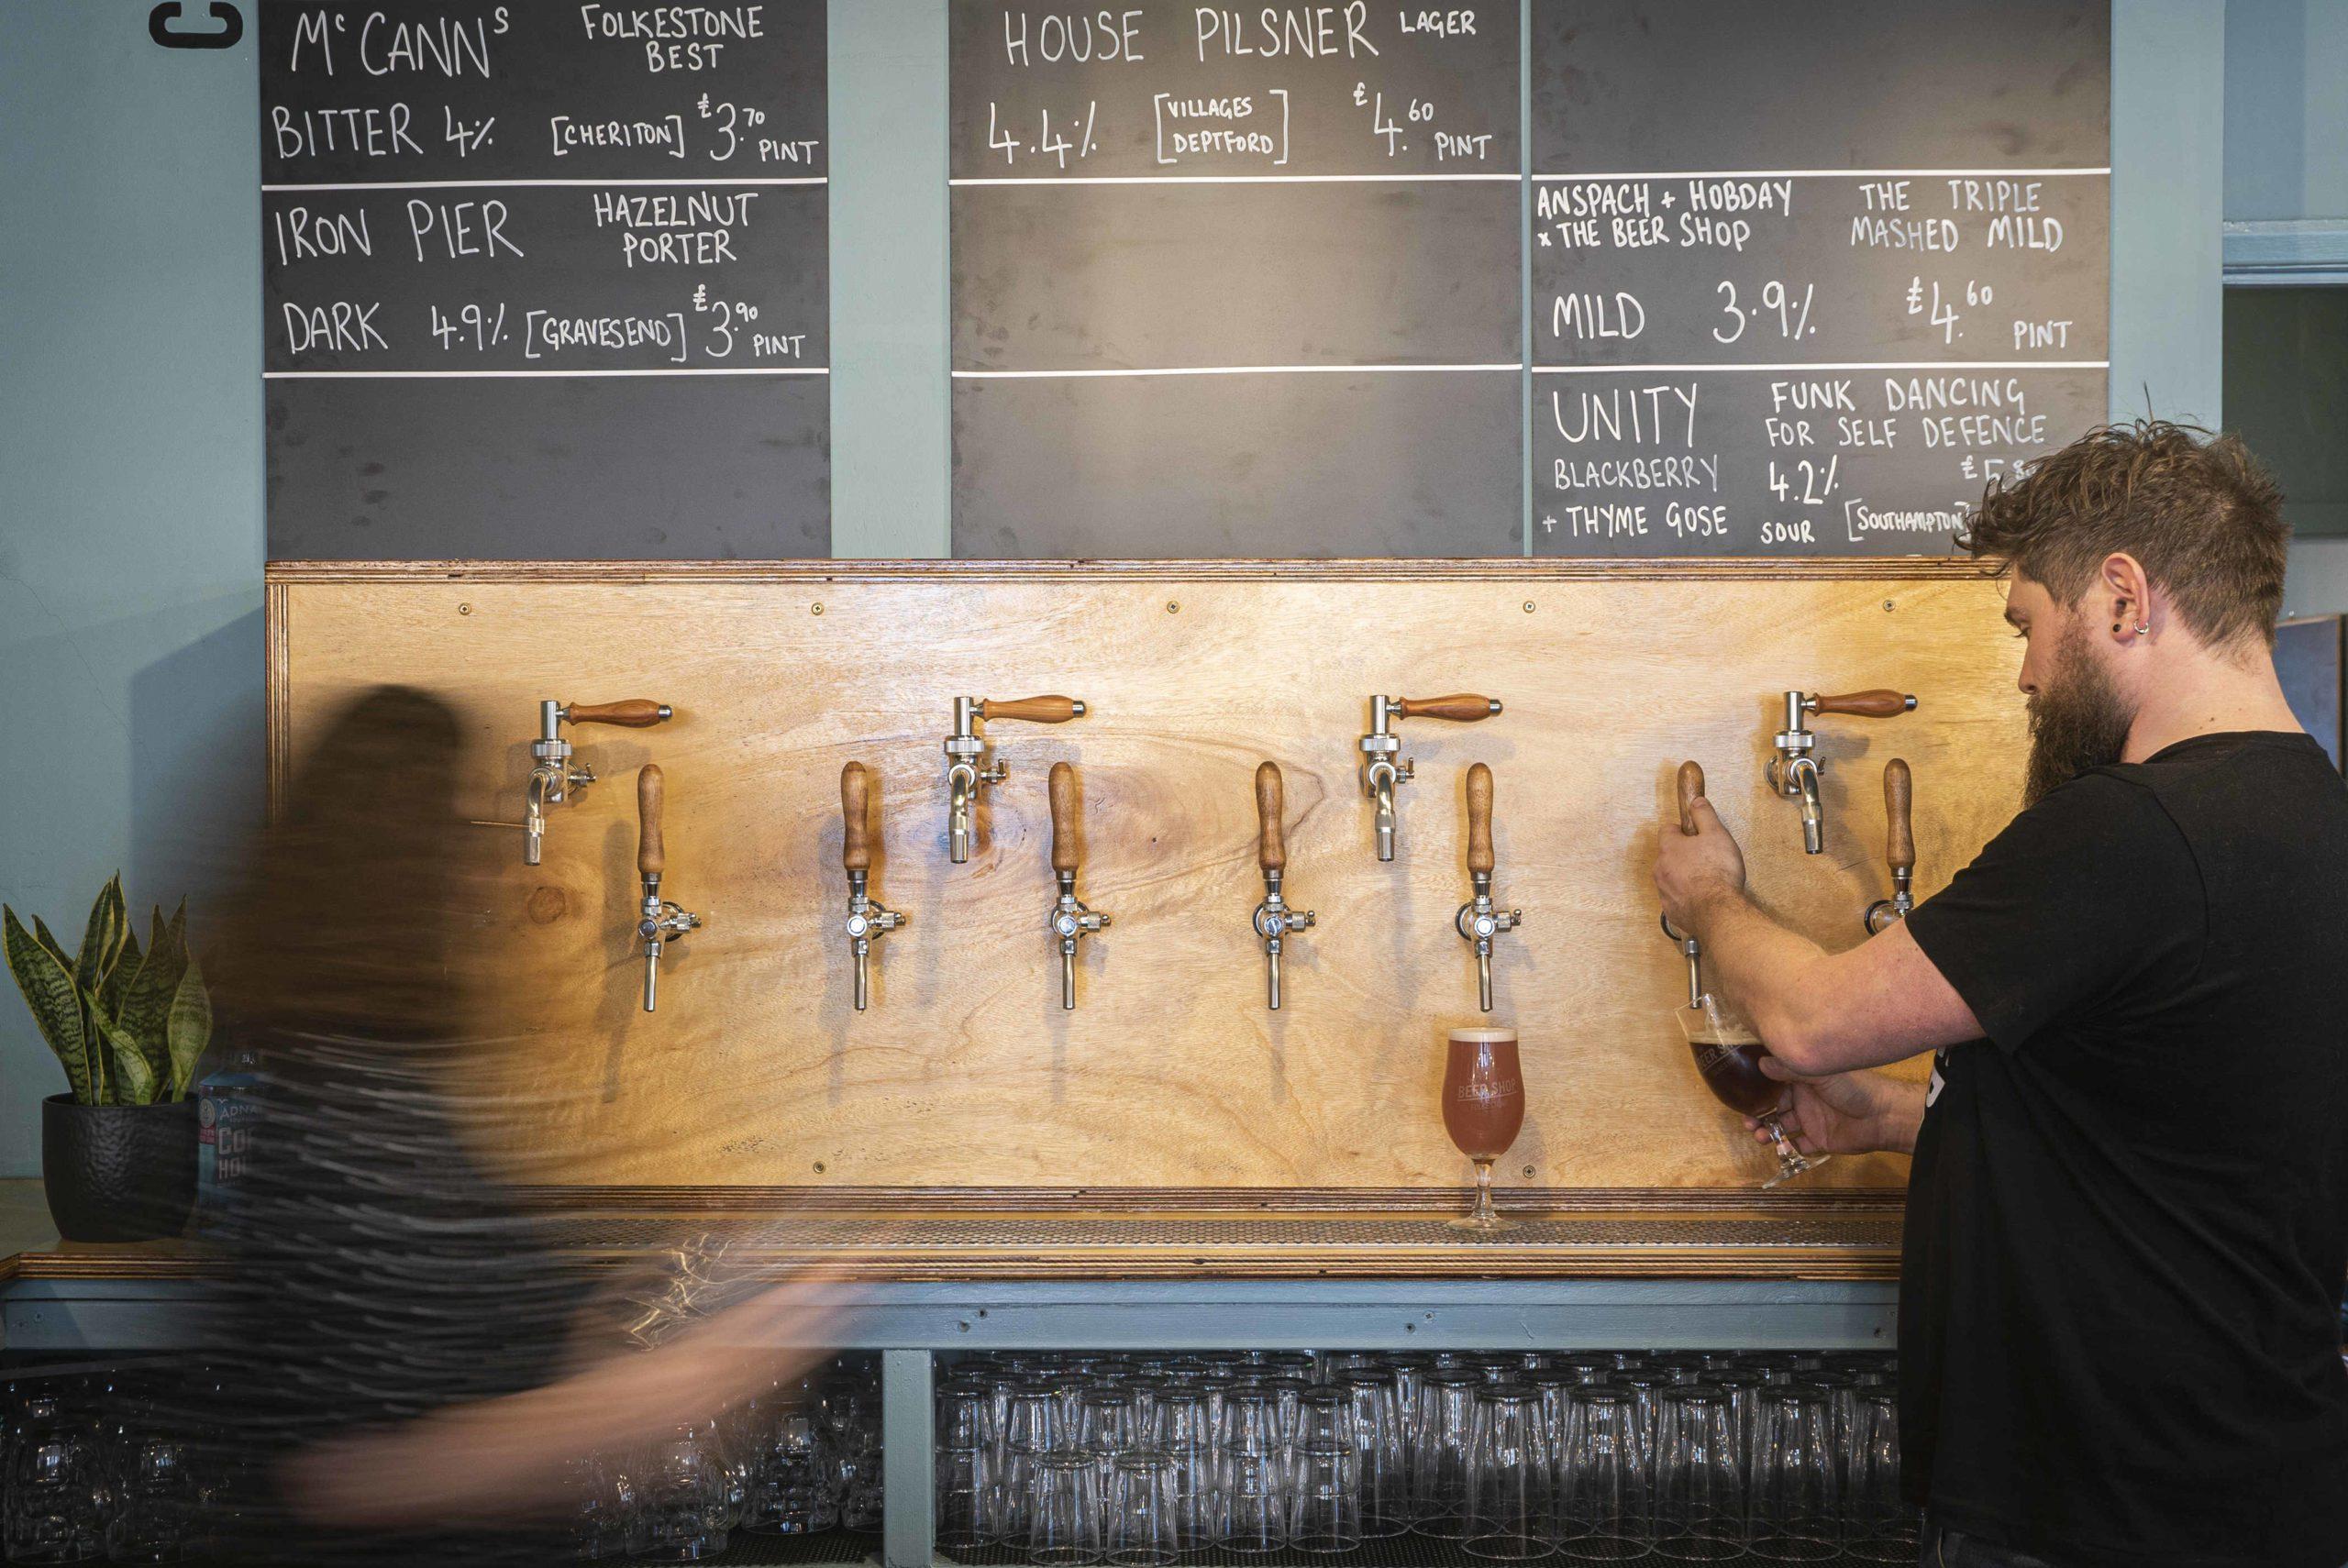 The Beer Shop Bar